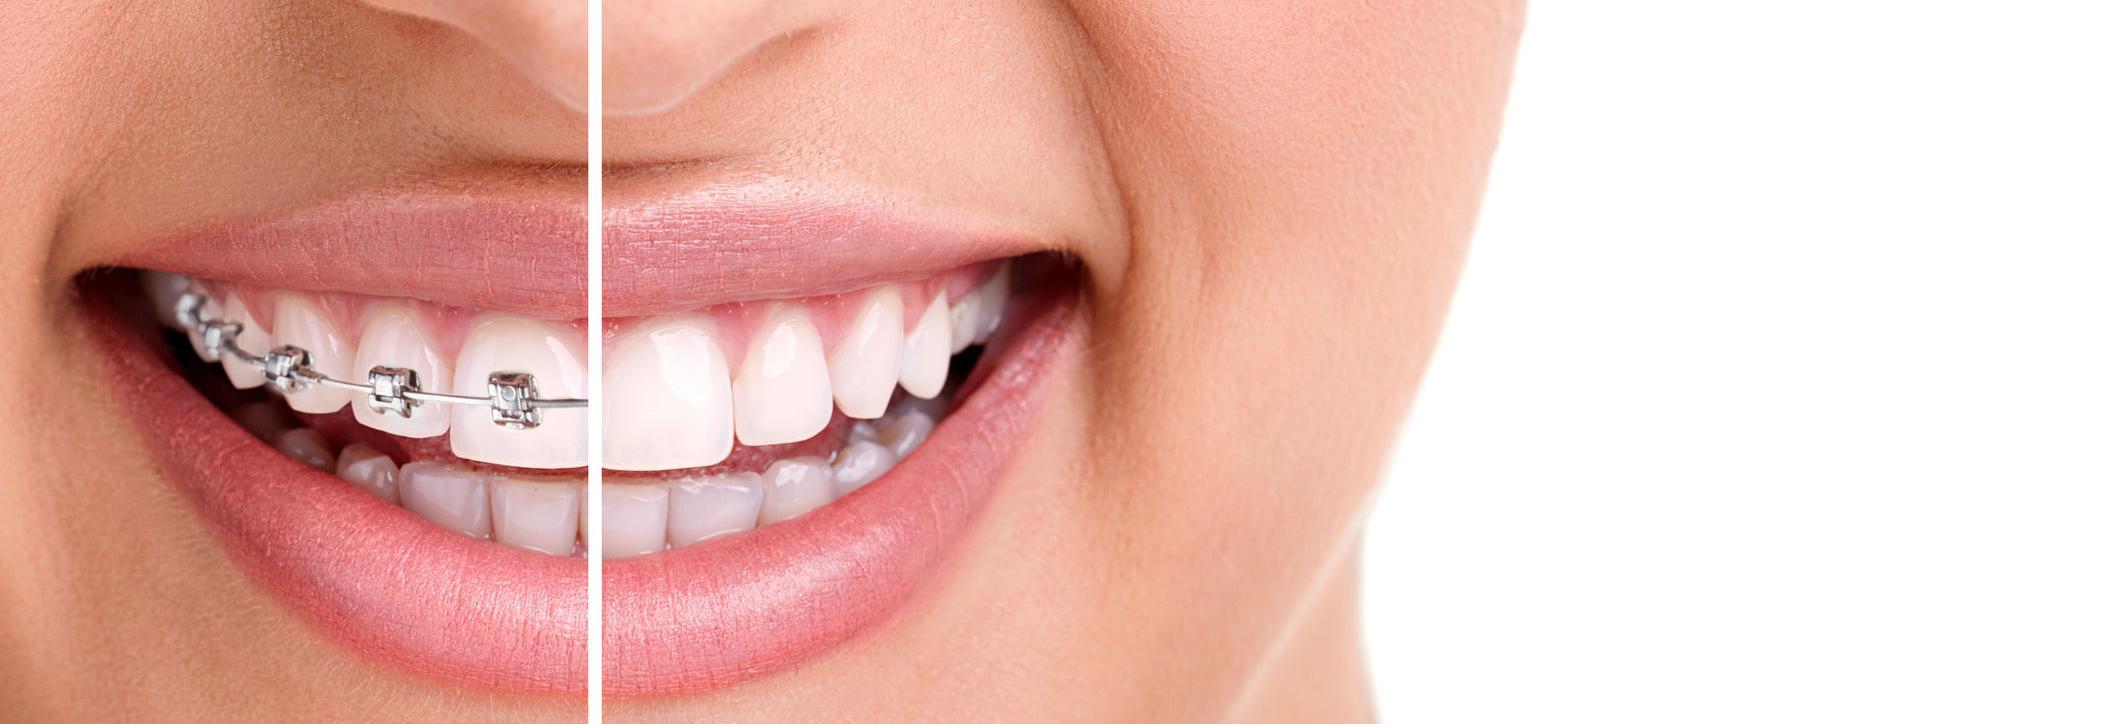 smile, braces, invisilign, teeth, mouth